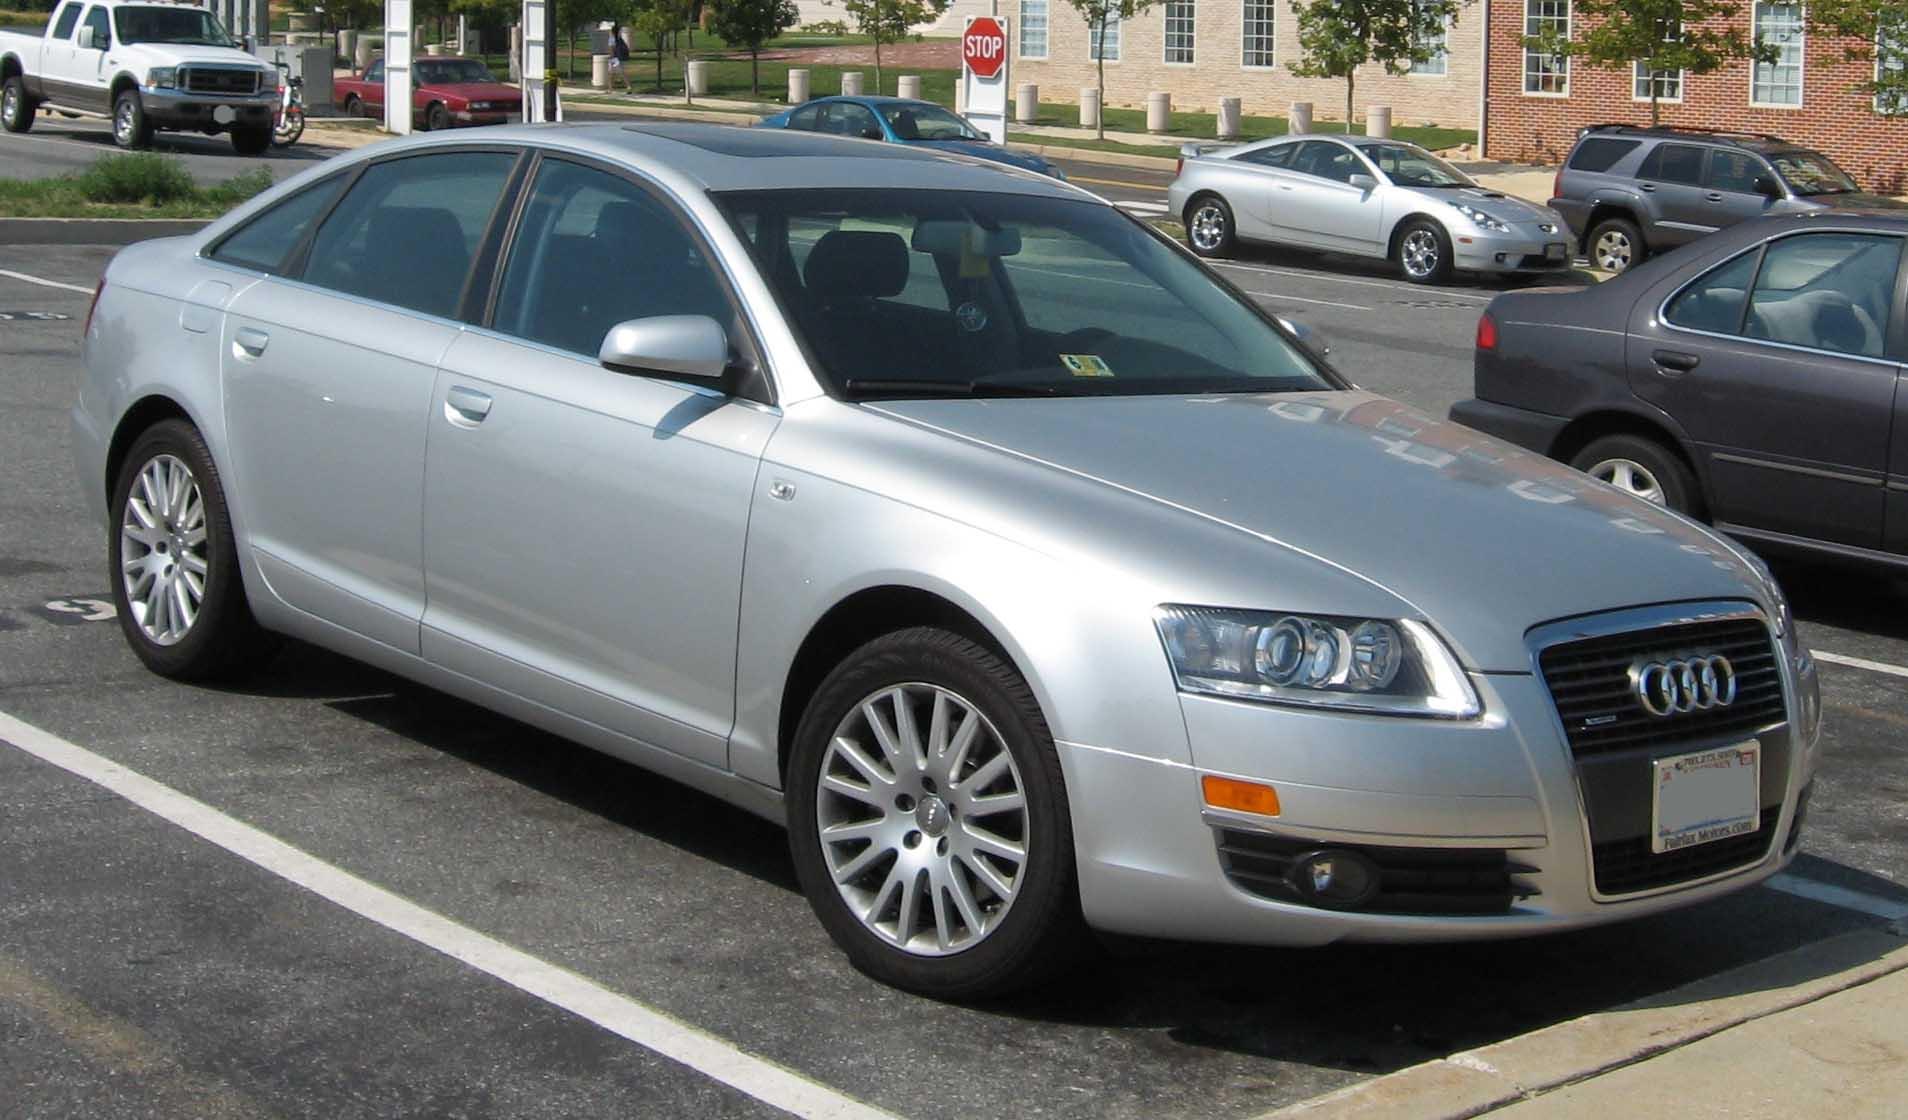 File:05-07 Audi A6-3.2.jpg - Wikimedia Commons